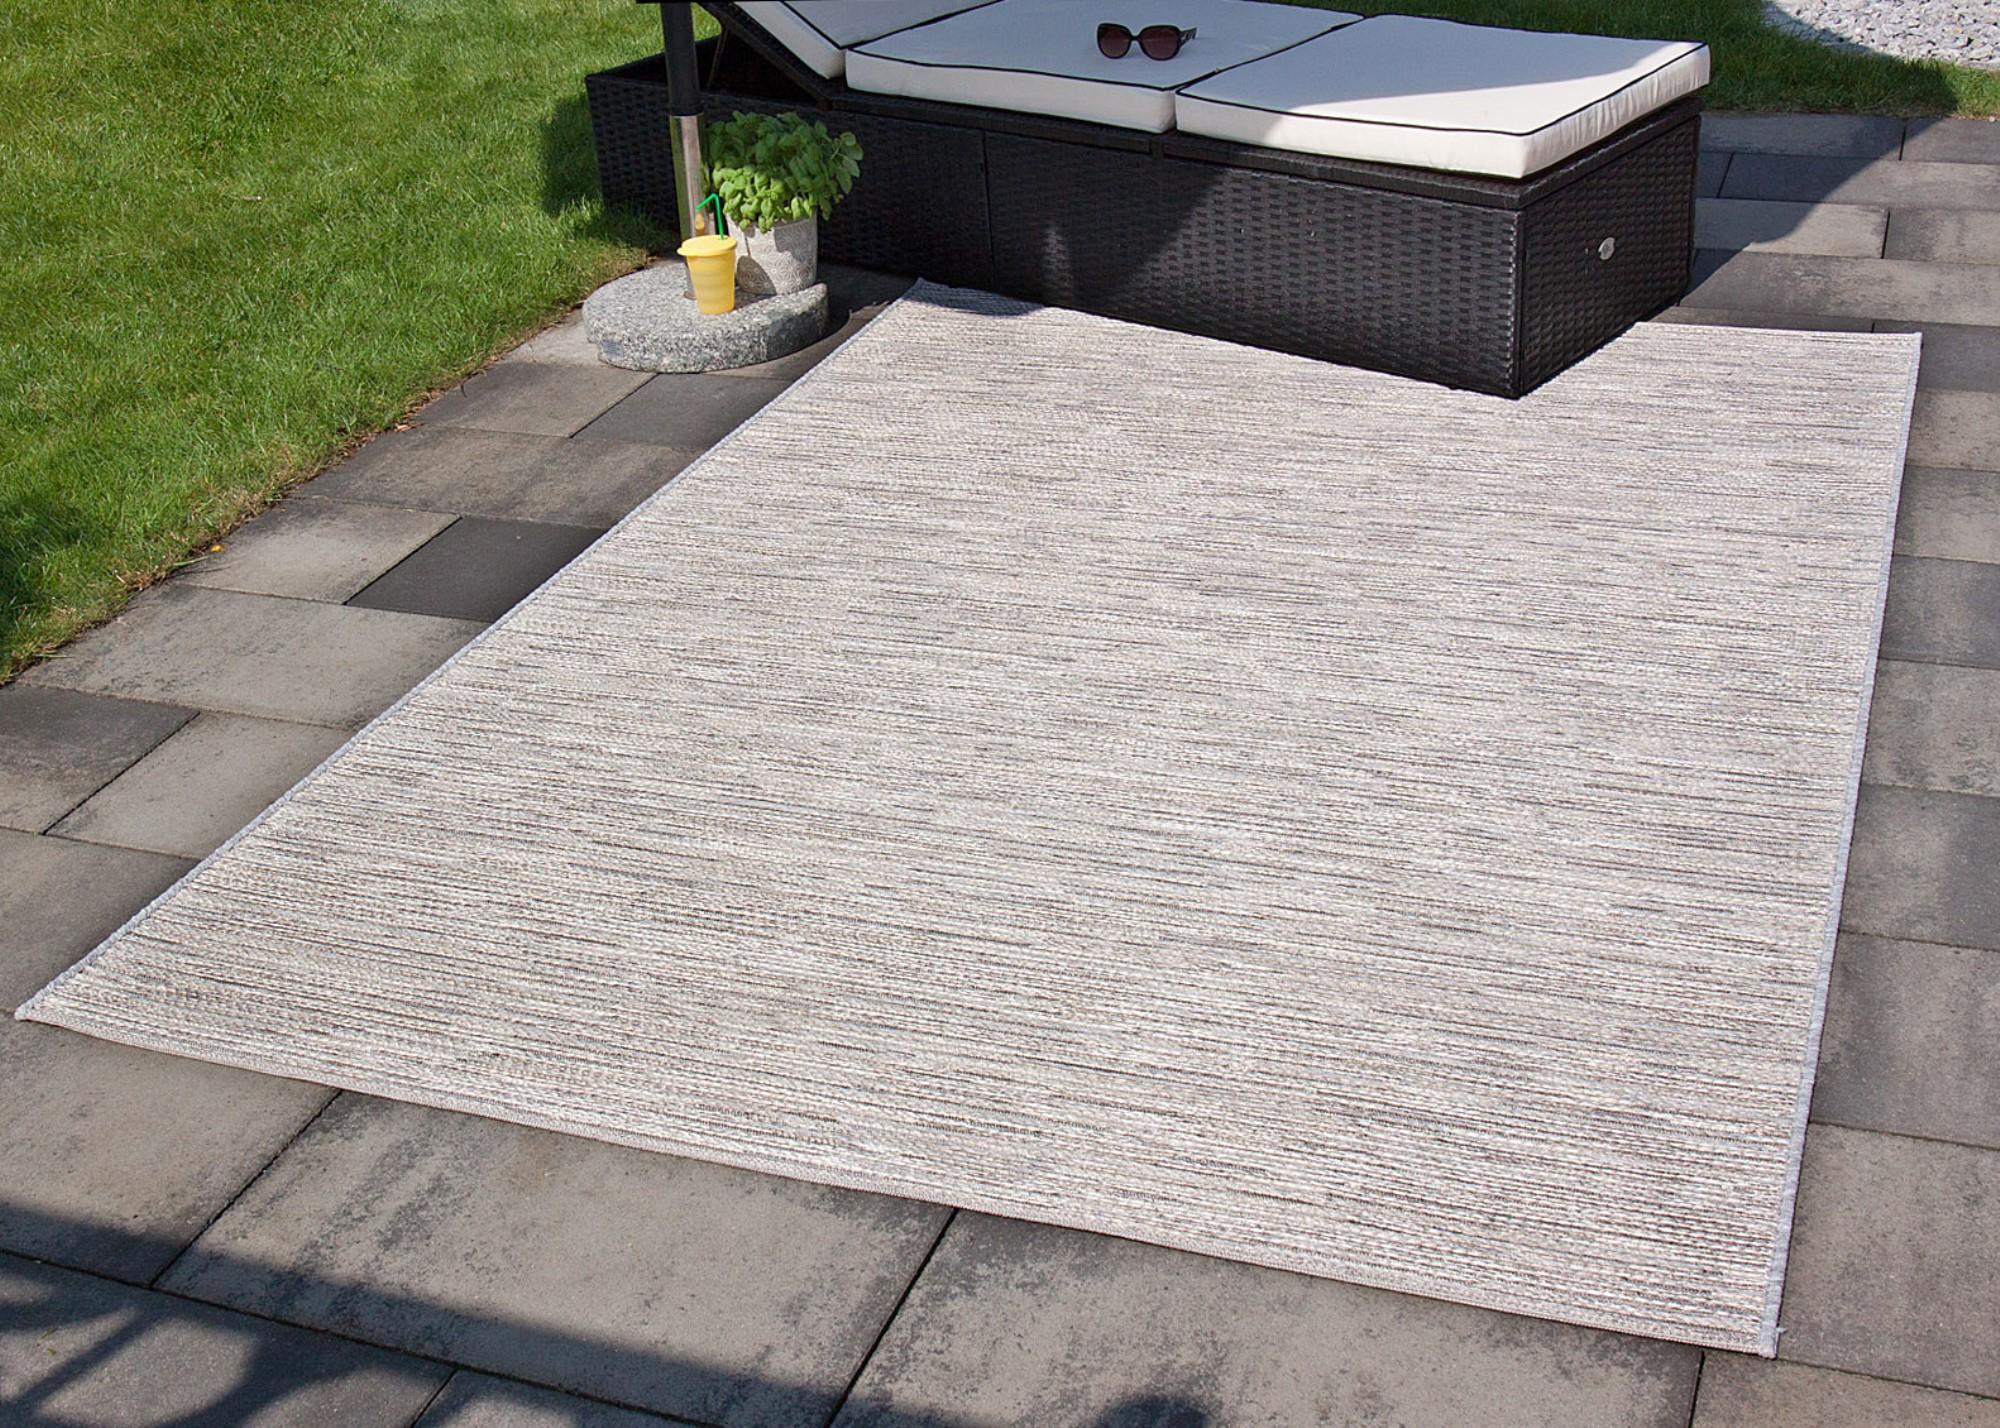 fab6663298cbbc In- und Outdoor Teppich Balkon Grau Türkis Gelb Rosa Mint Mandal   eBay